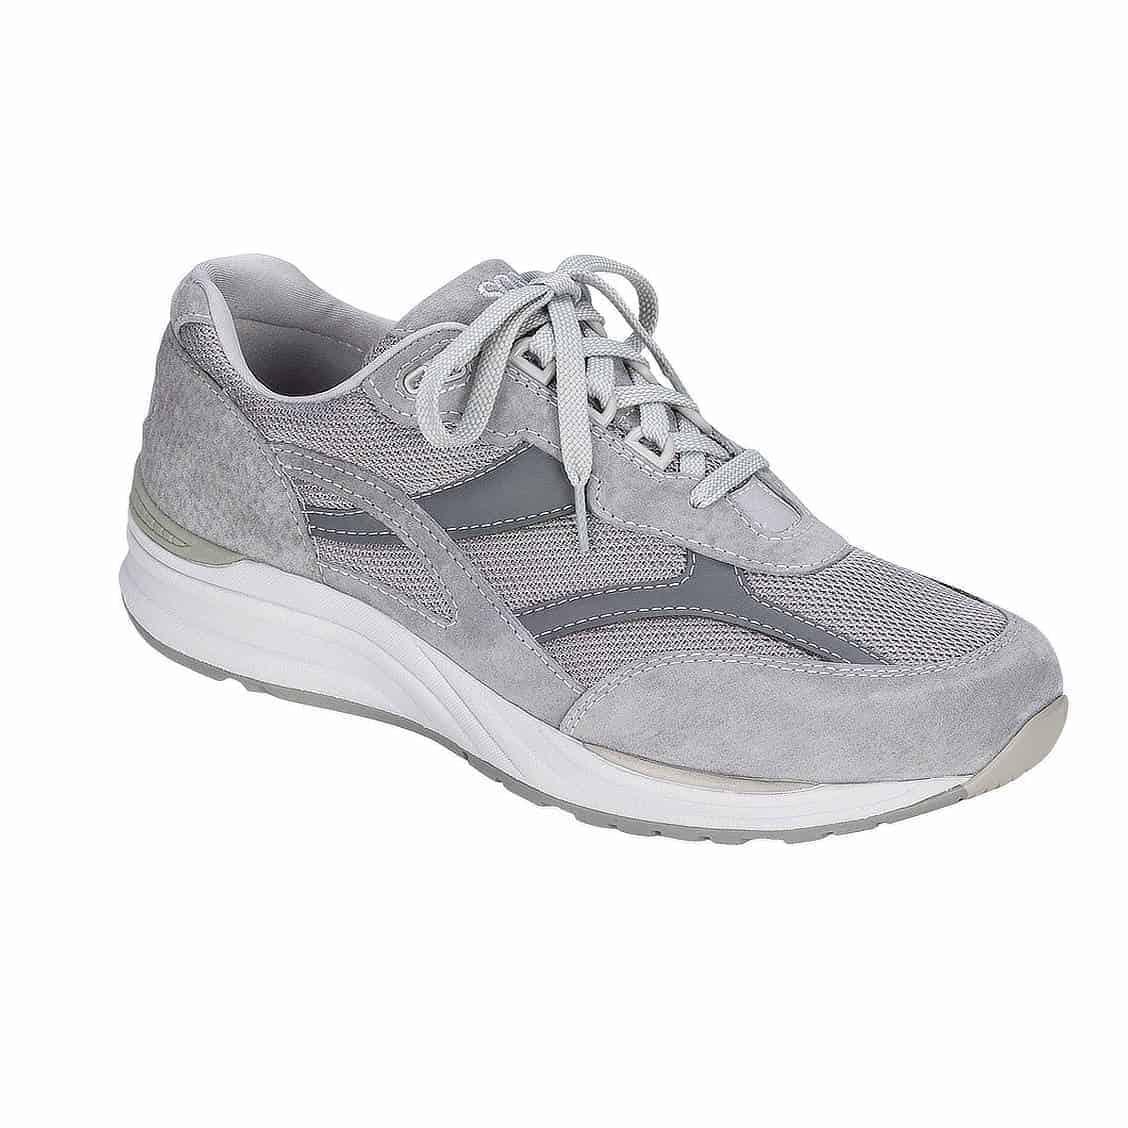 sas-mens-journey-mesh-gray-2028-012-1